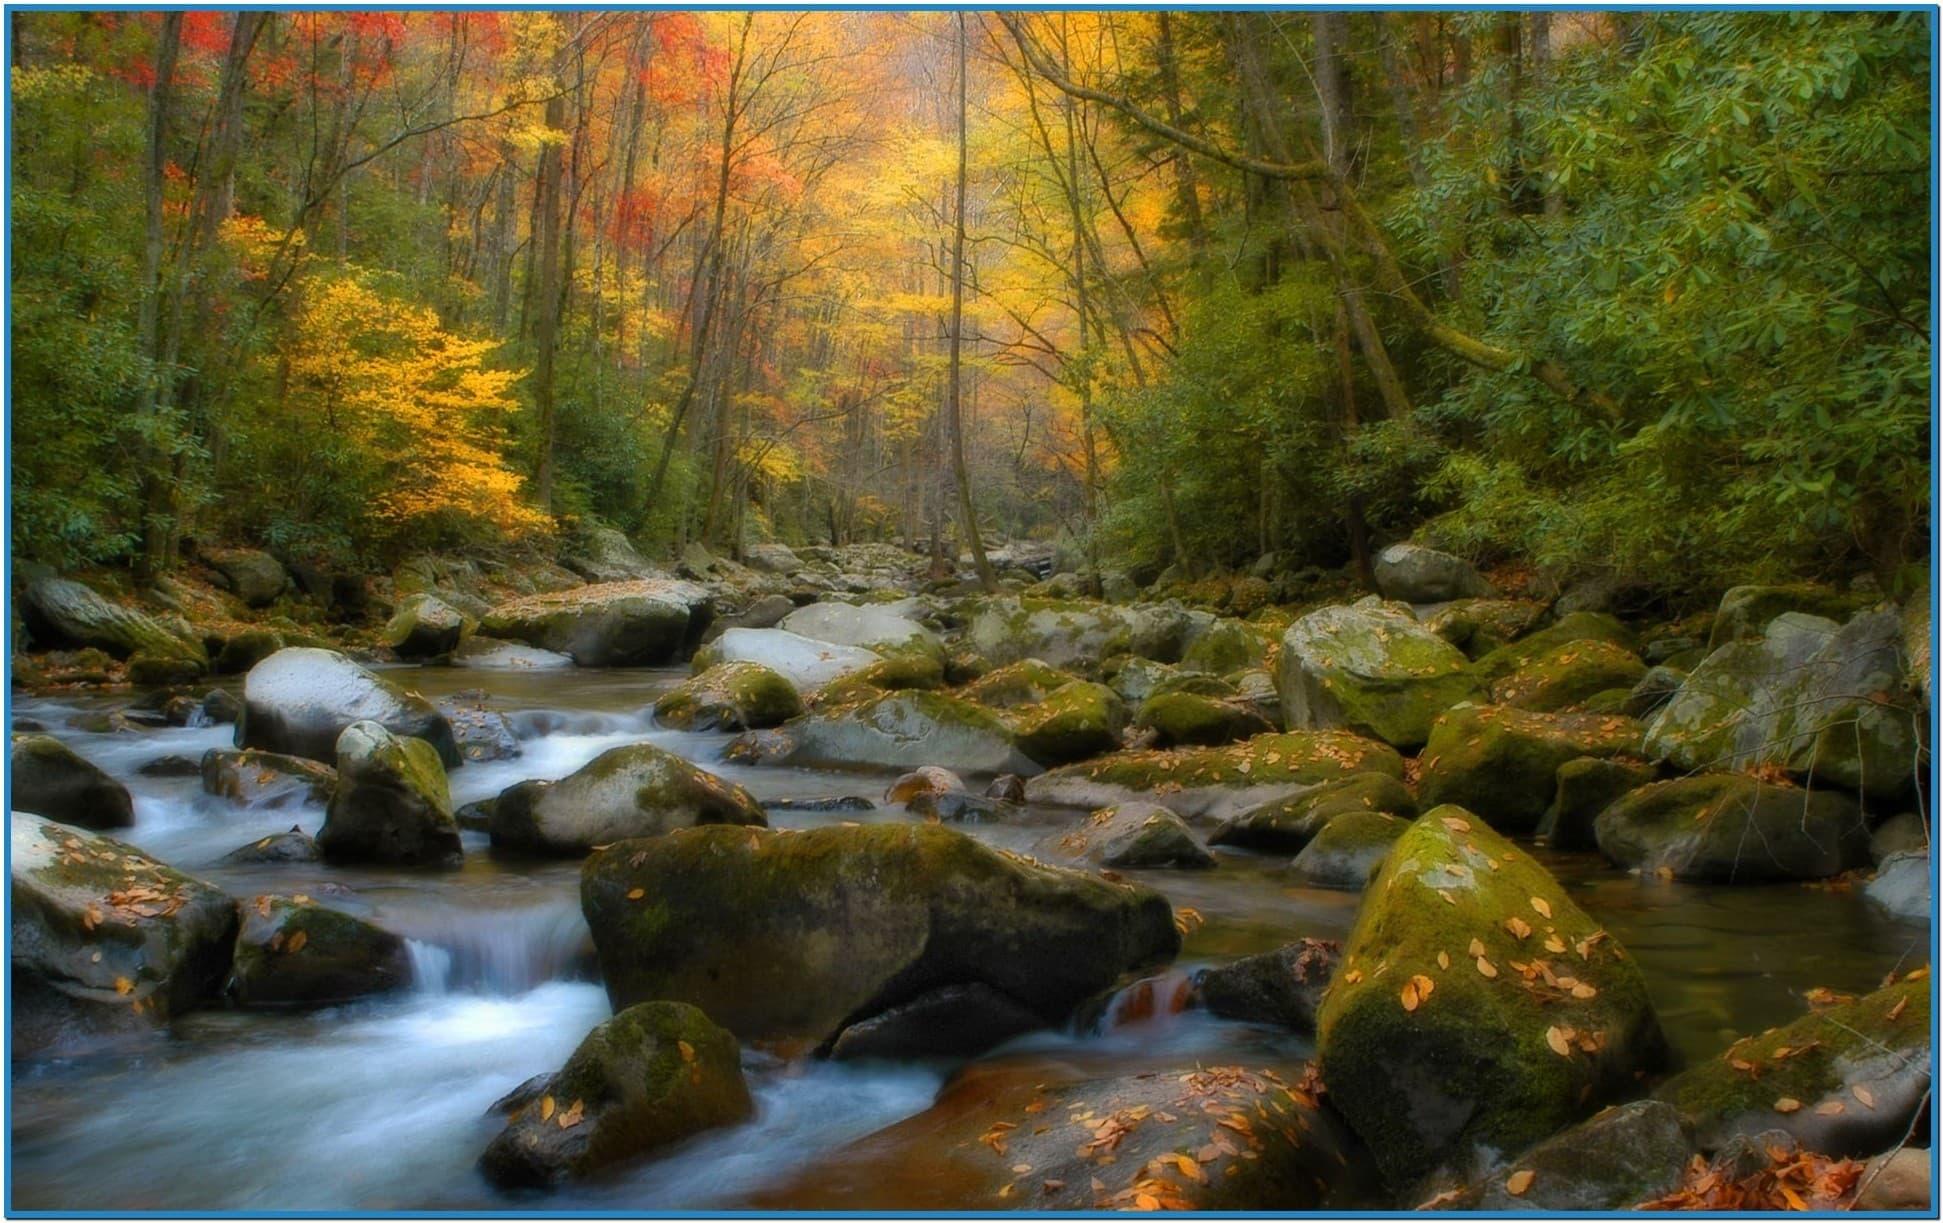 Screensaver nature scenes   Download 1943x1223